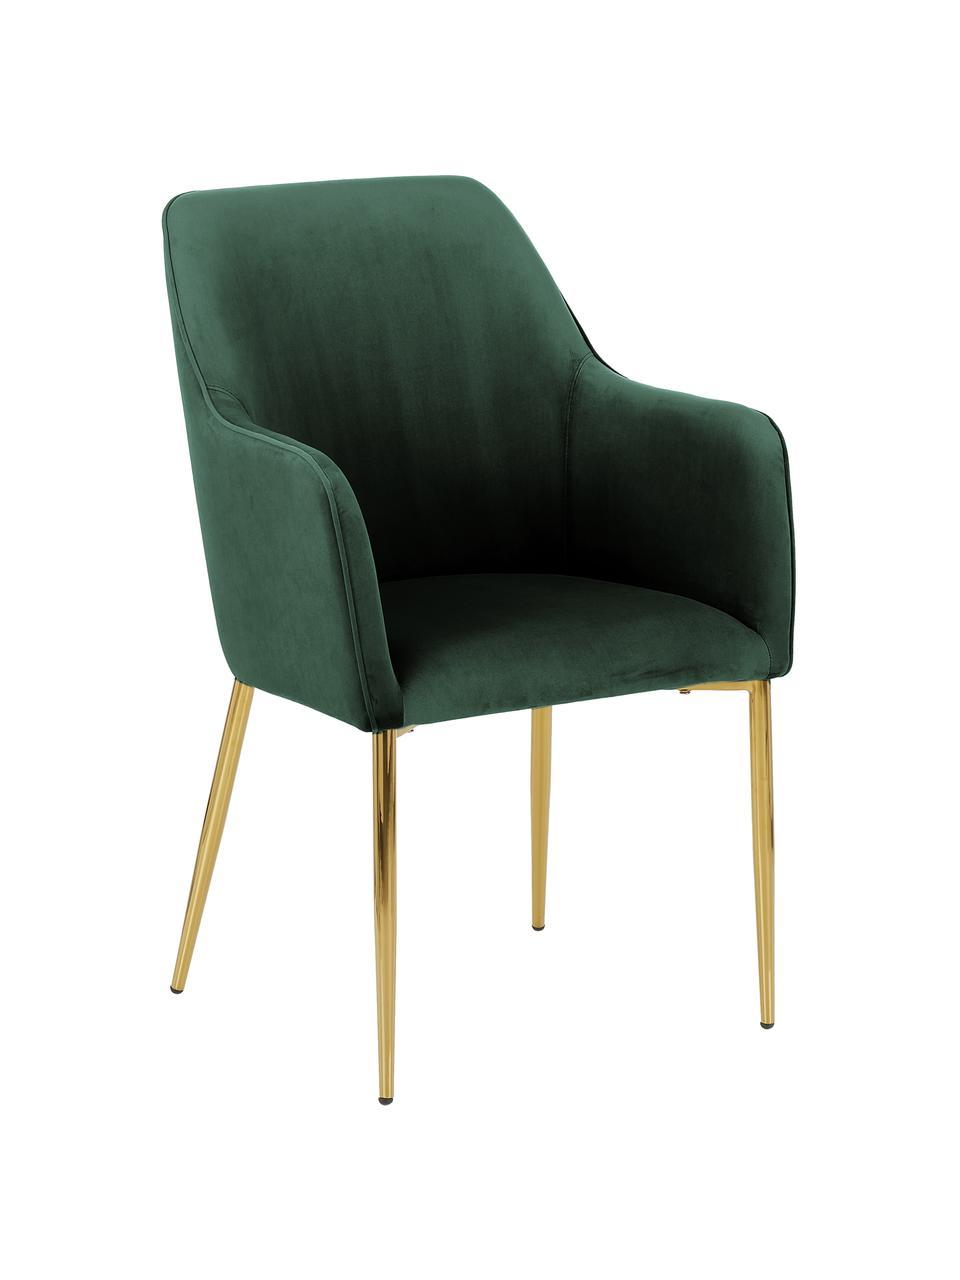 Samt-Armlehnstuhl Ava in Dunklegrün, Bezug: Samt (100% Polyester) Der, Beine: Metall, galvanisiert, Samt Dunkelgrün, B 57 x T 63 cm